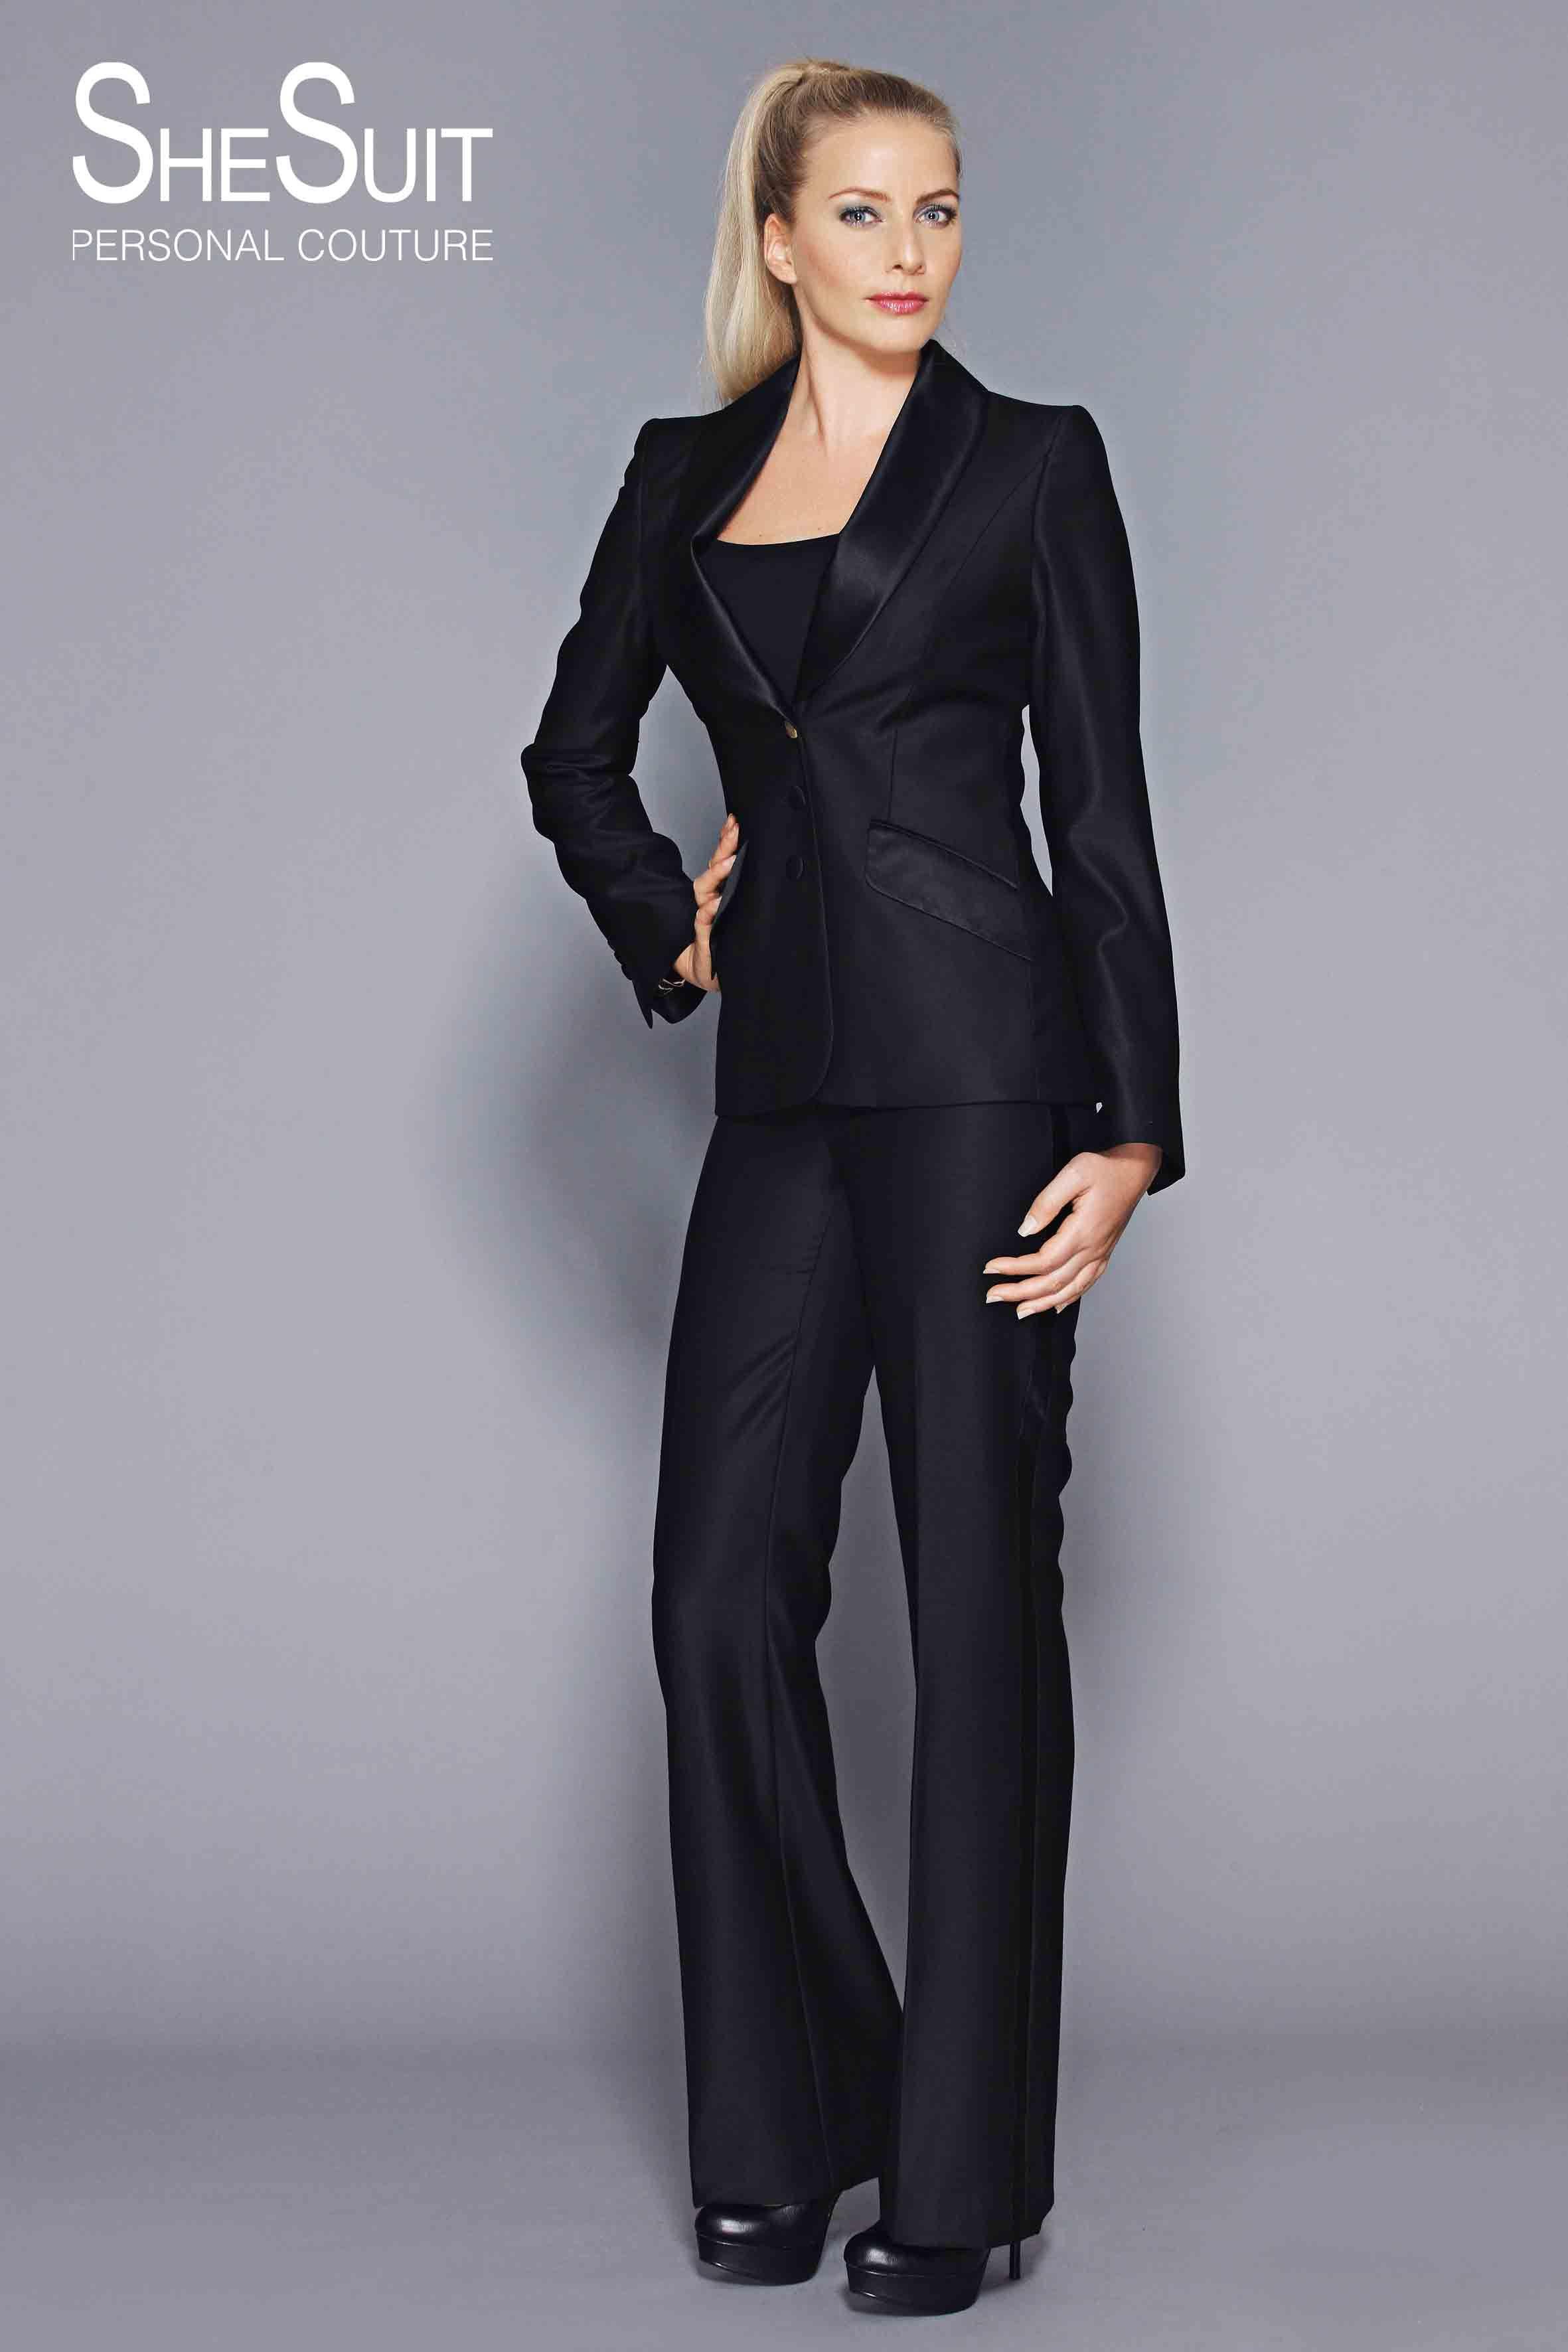 Inspiratie Modellen   Outfits, Broekpakken, Kleding